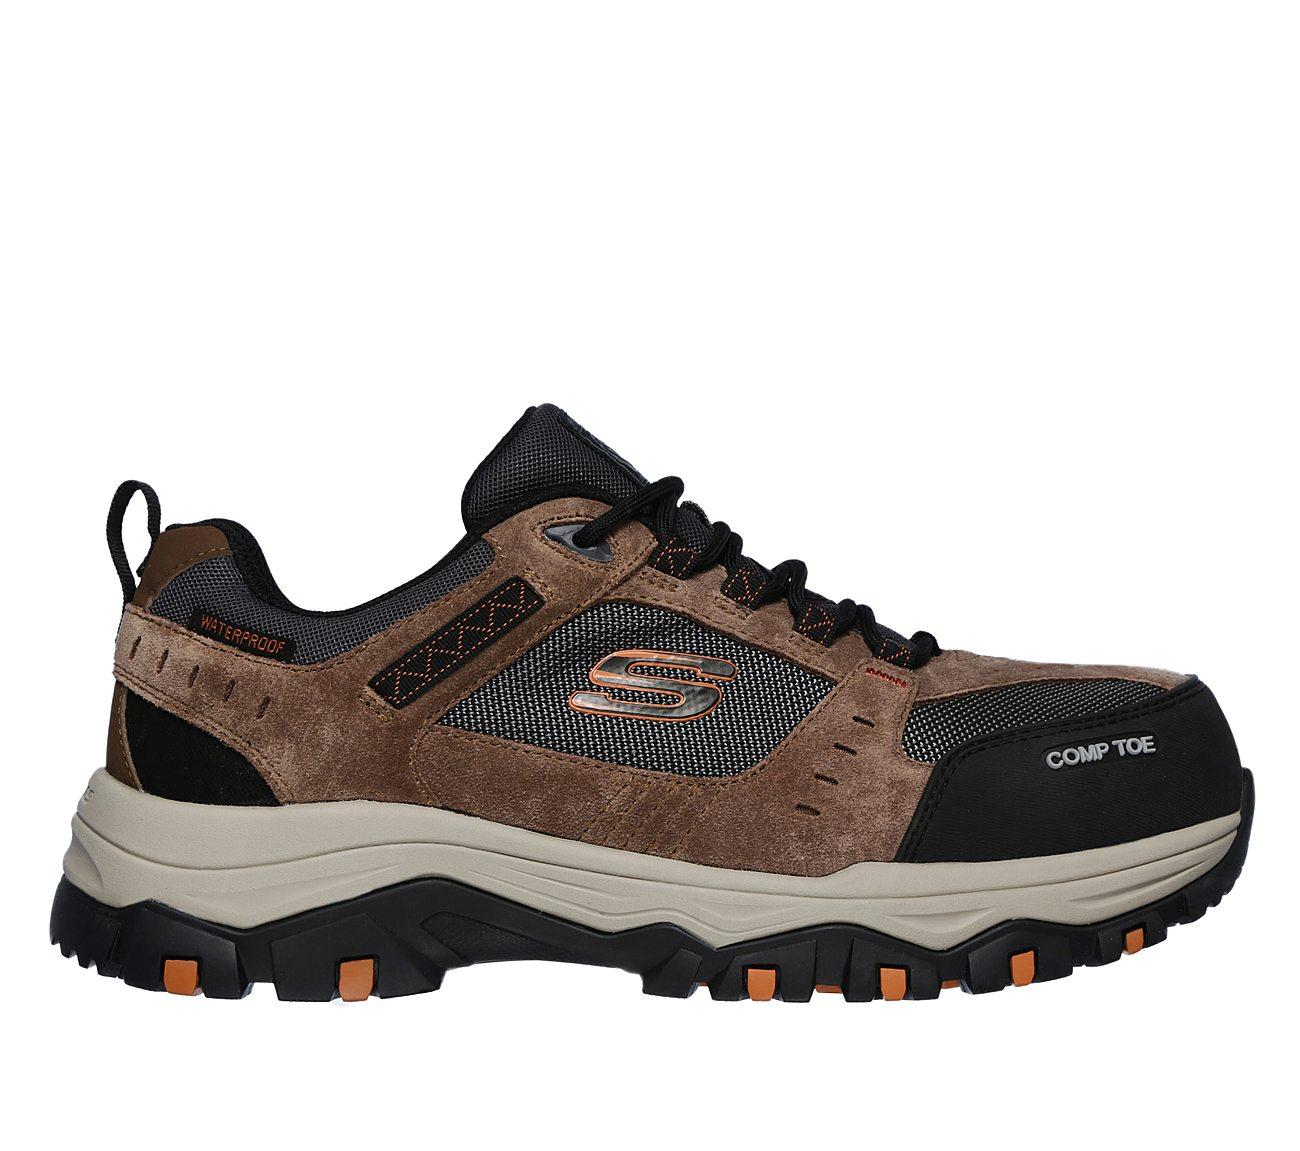 Buy SKECHERS Work Sicherheitsschuh: Greetah Comp Toe Work Shoes RDfzZ